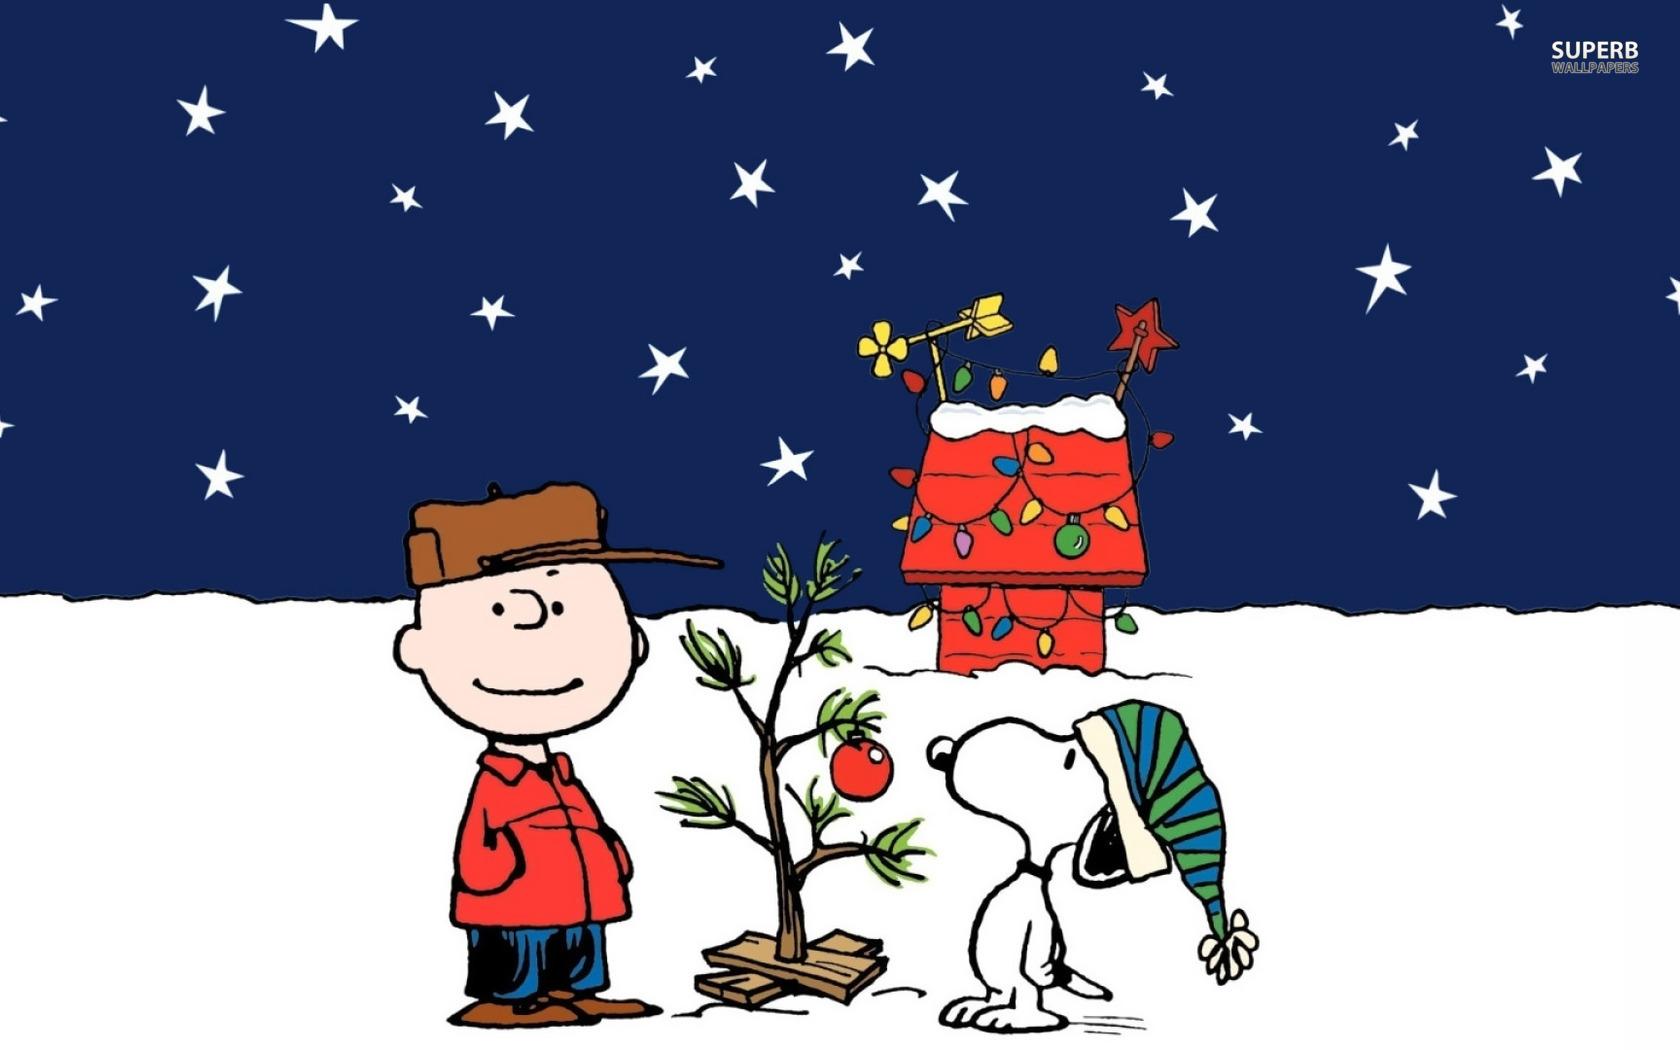 Free Charlie Brown Christmas Wallpapers - WallpaperSafari